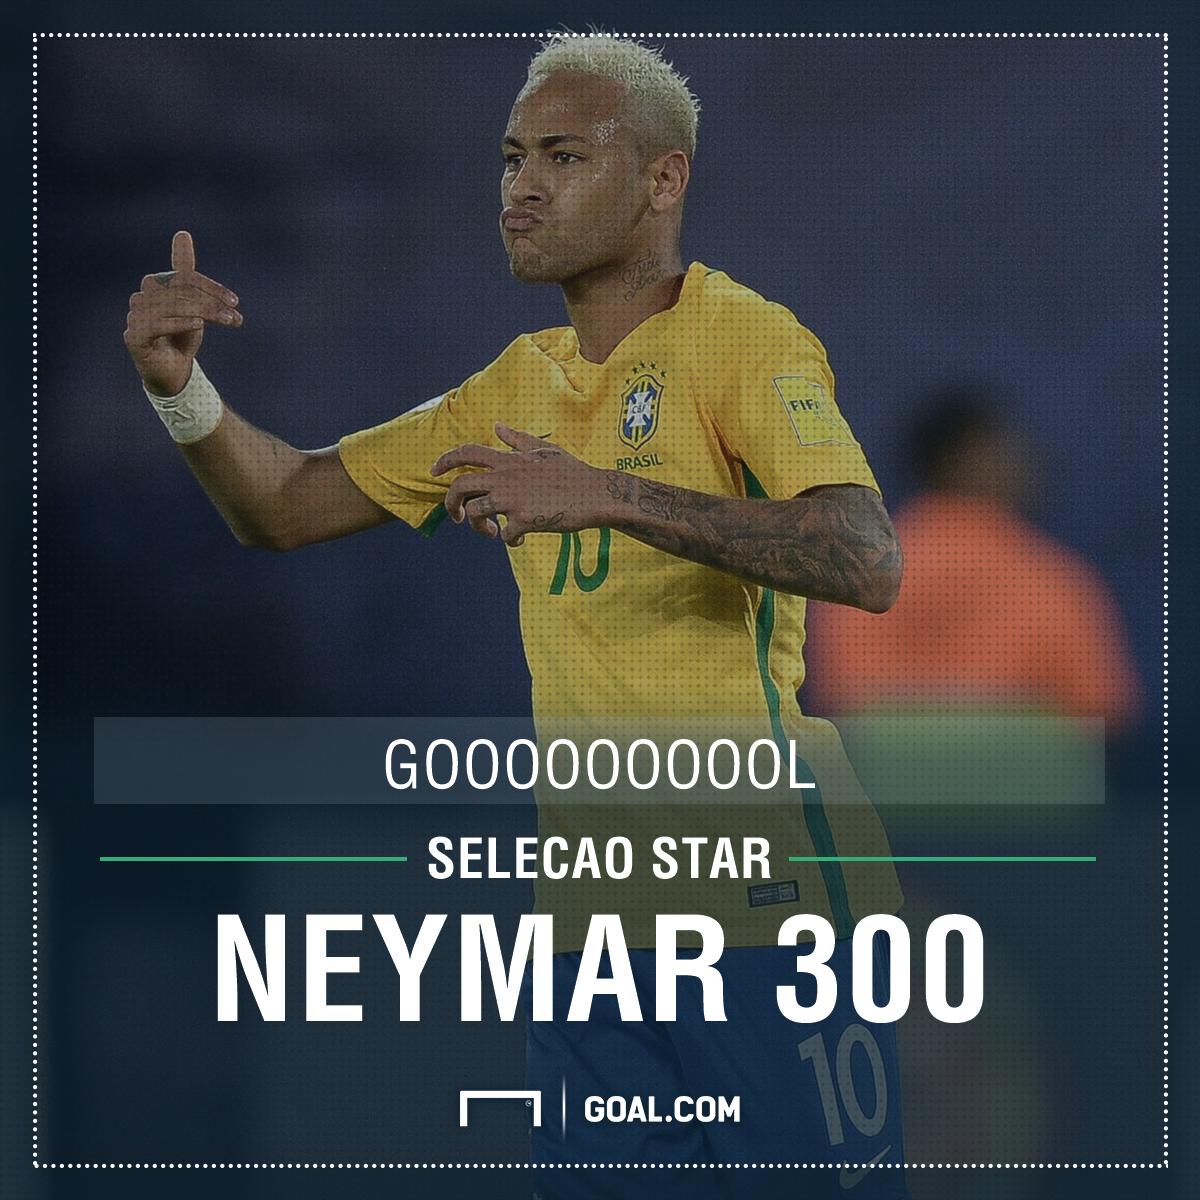 Neymar hits 300th career goal